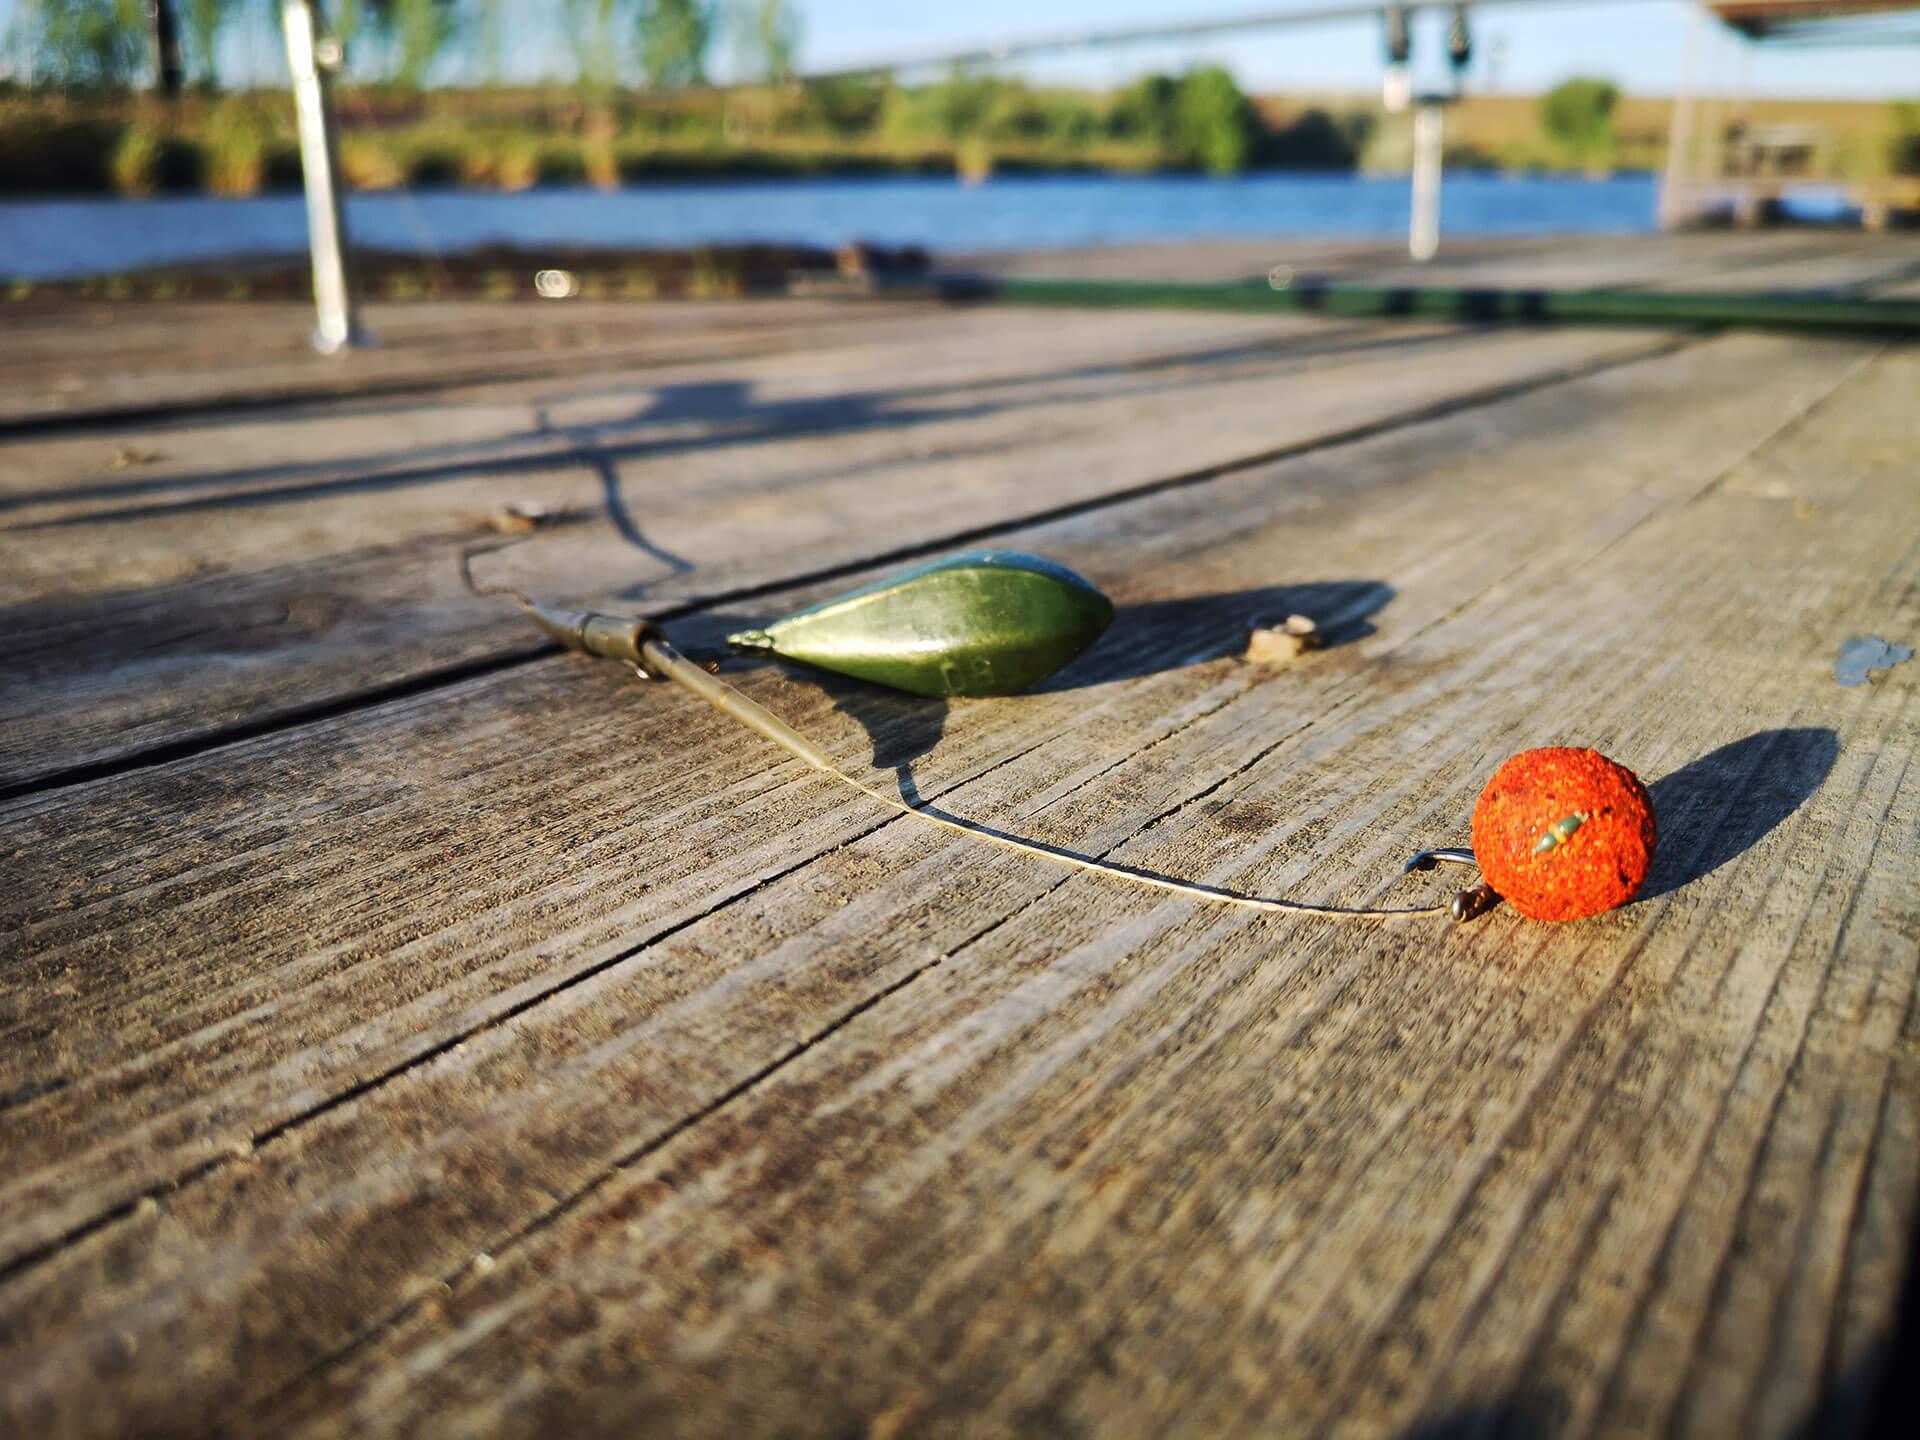 montura pescuit la crap cu boilies de nutritie